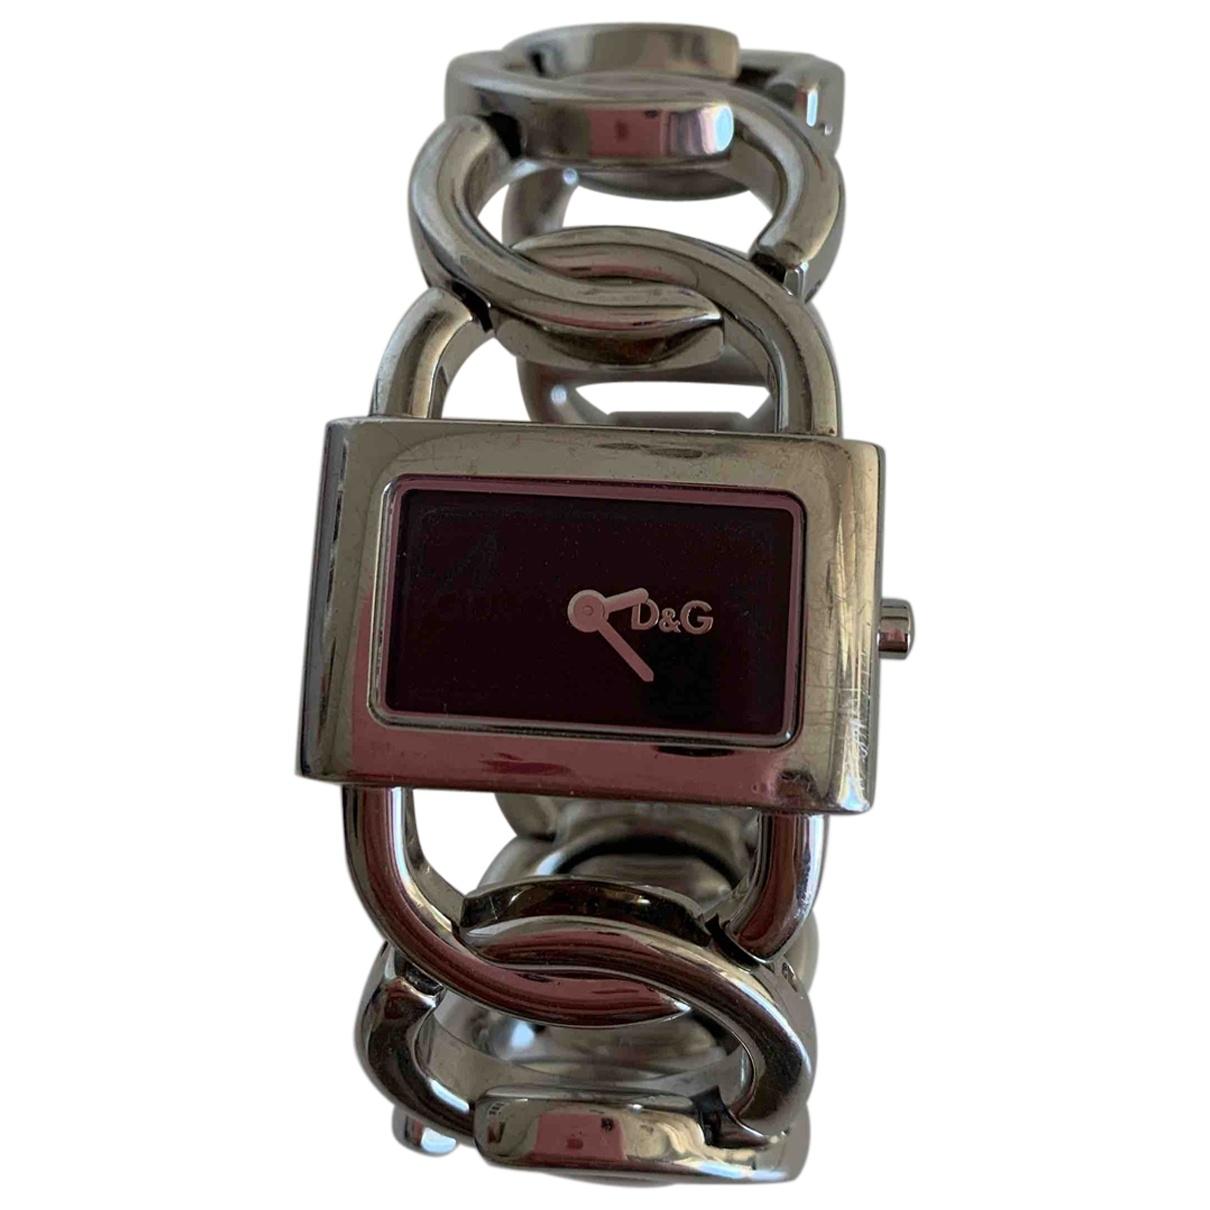 Reloj Dolce & Gabbana